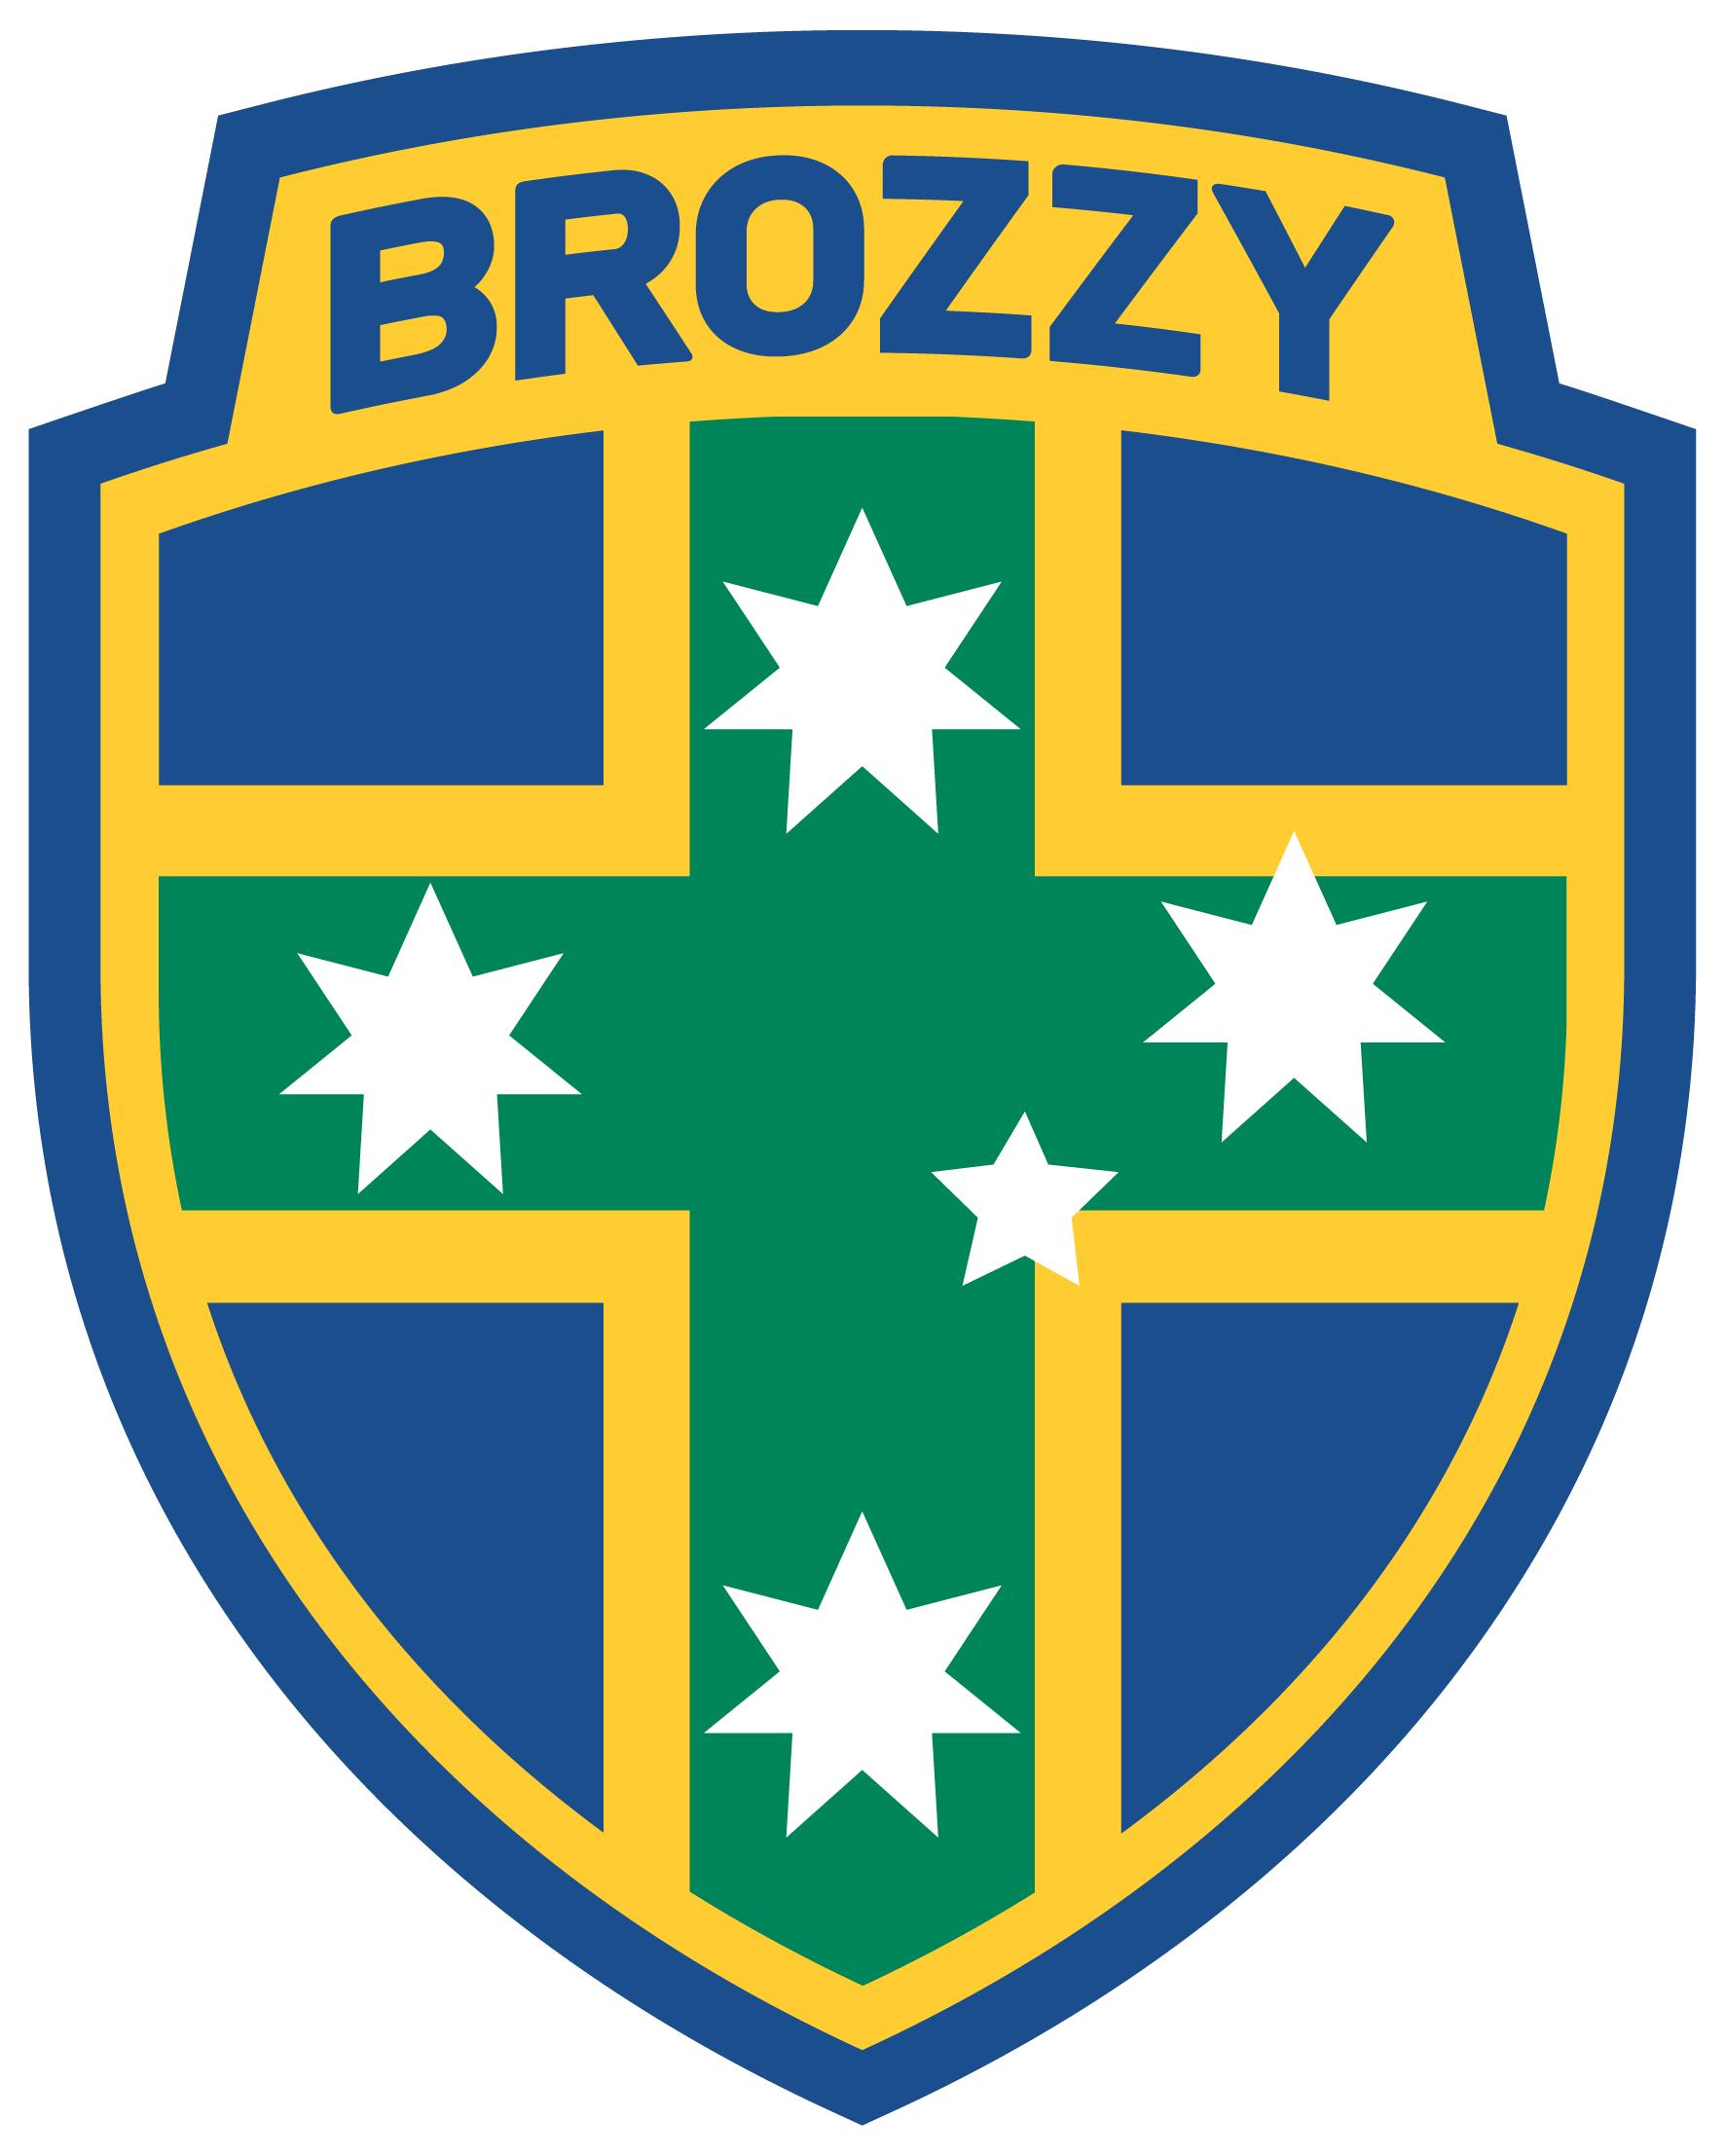 BrOzzy